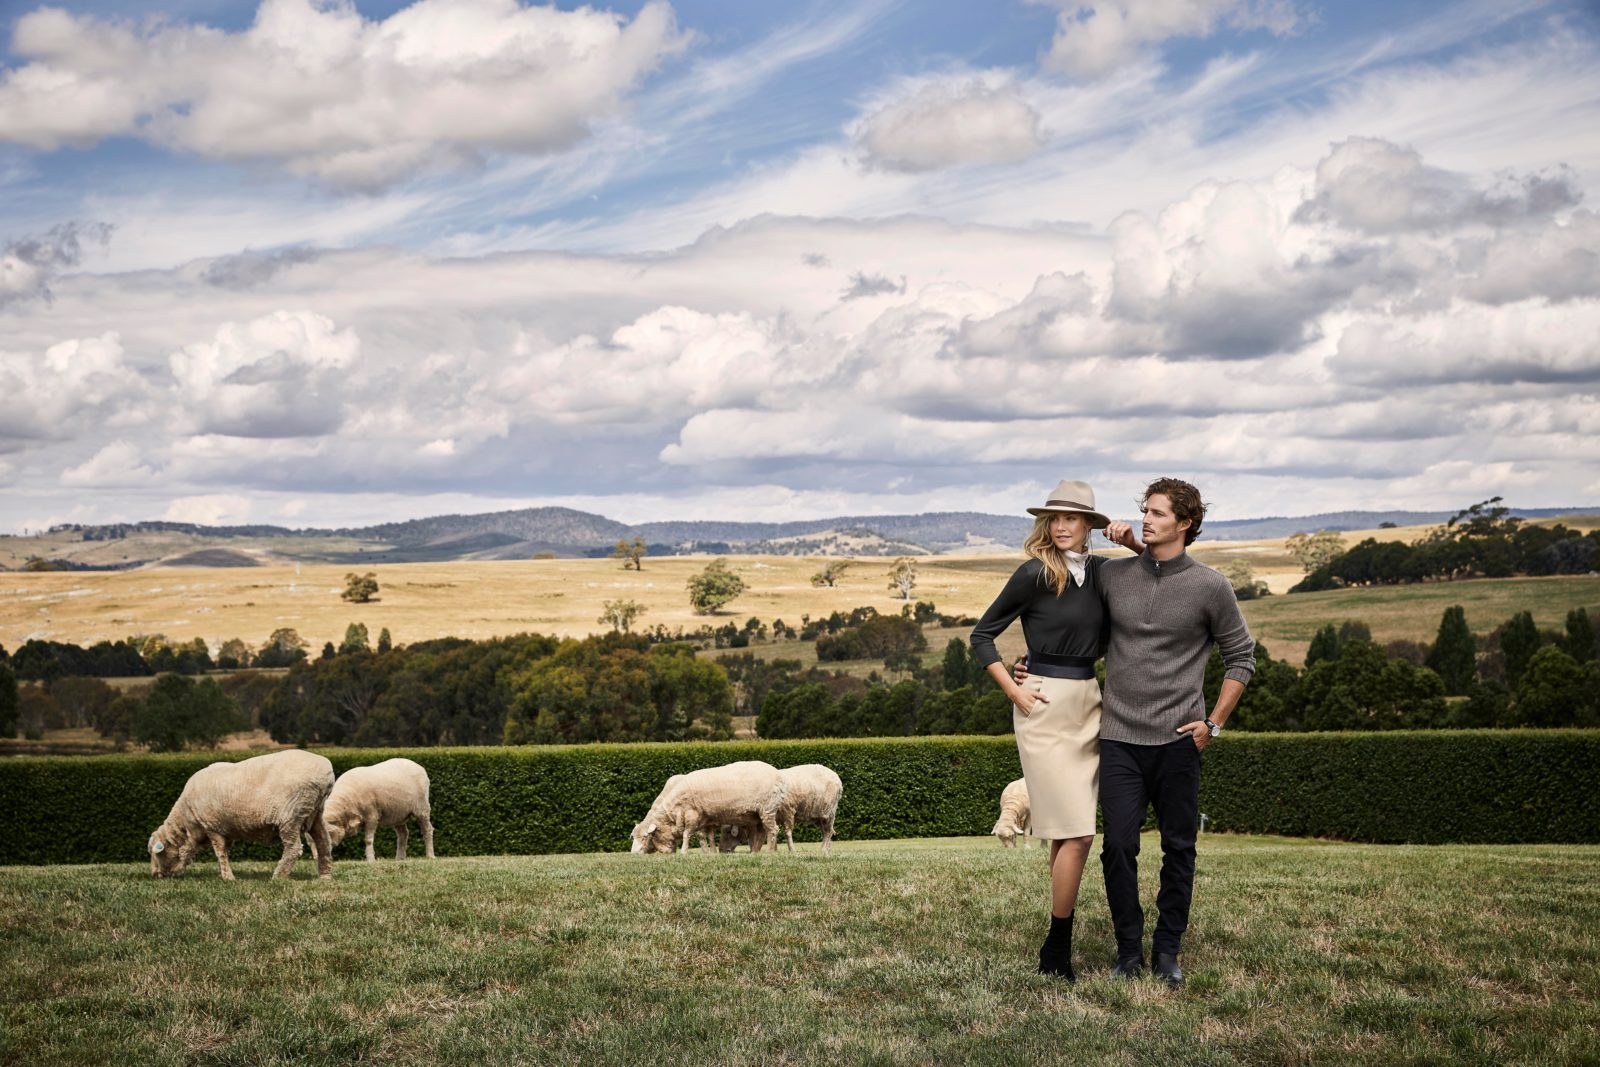 Australian merino wool garments - Australian made and owned.